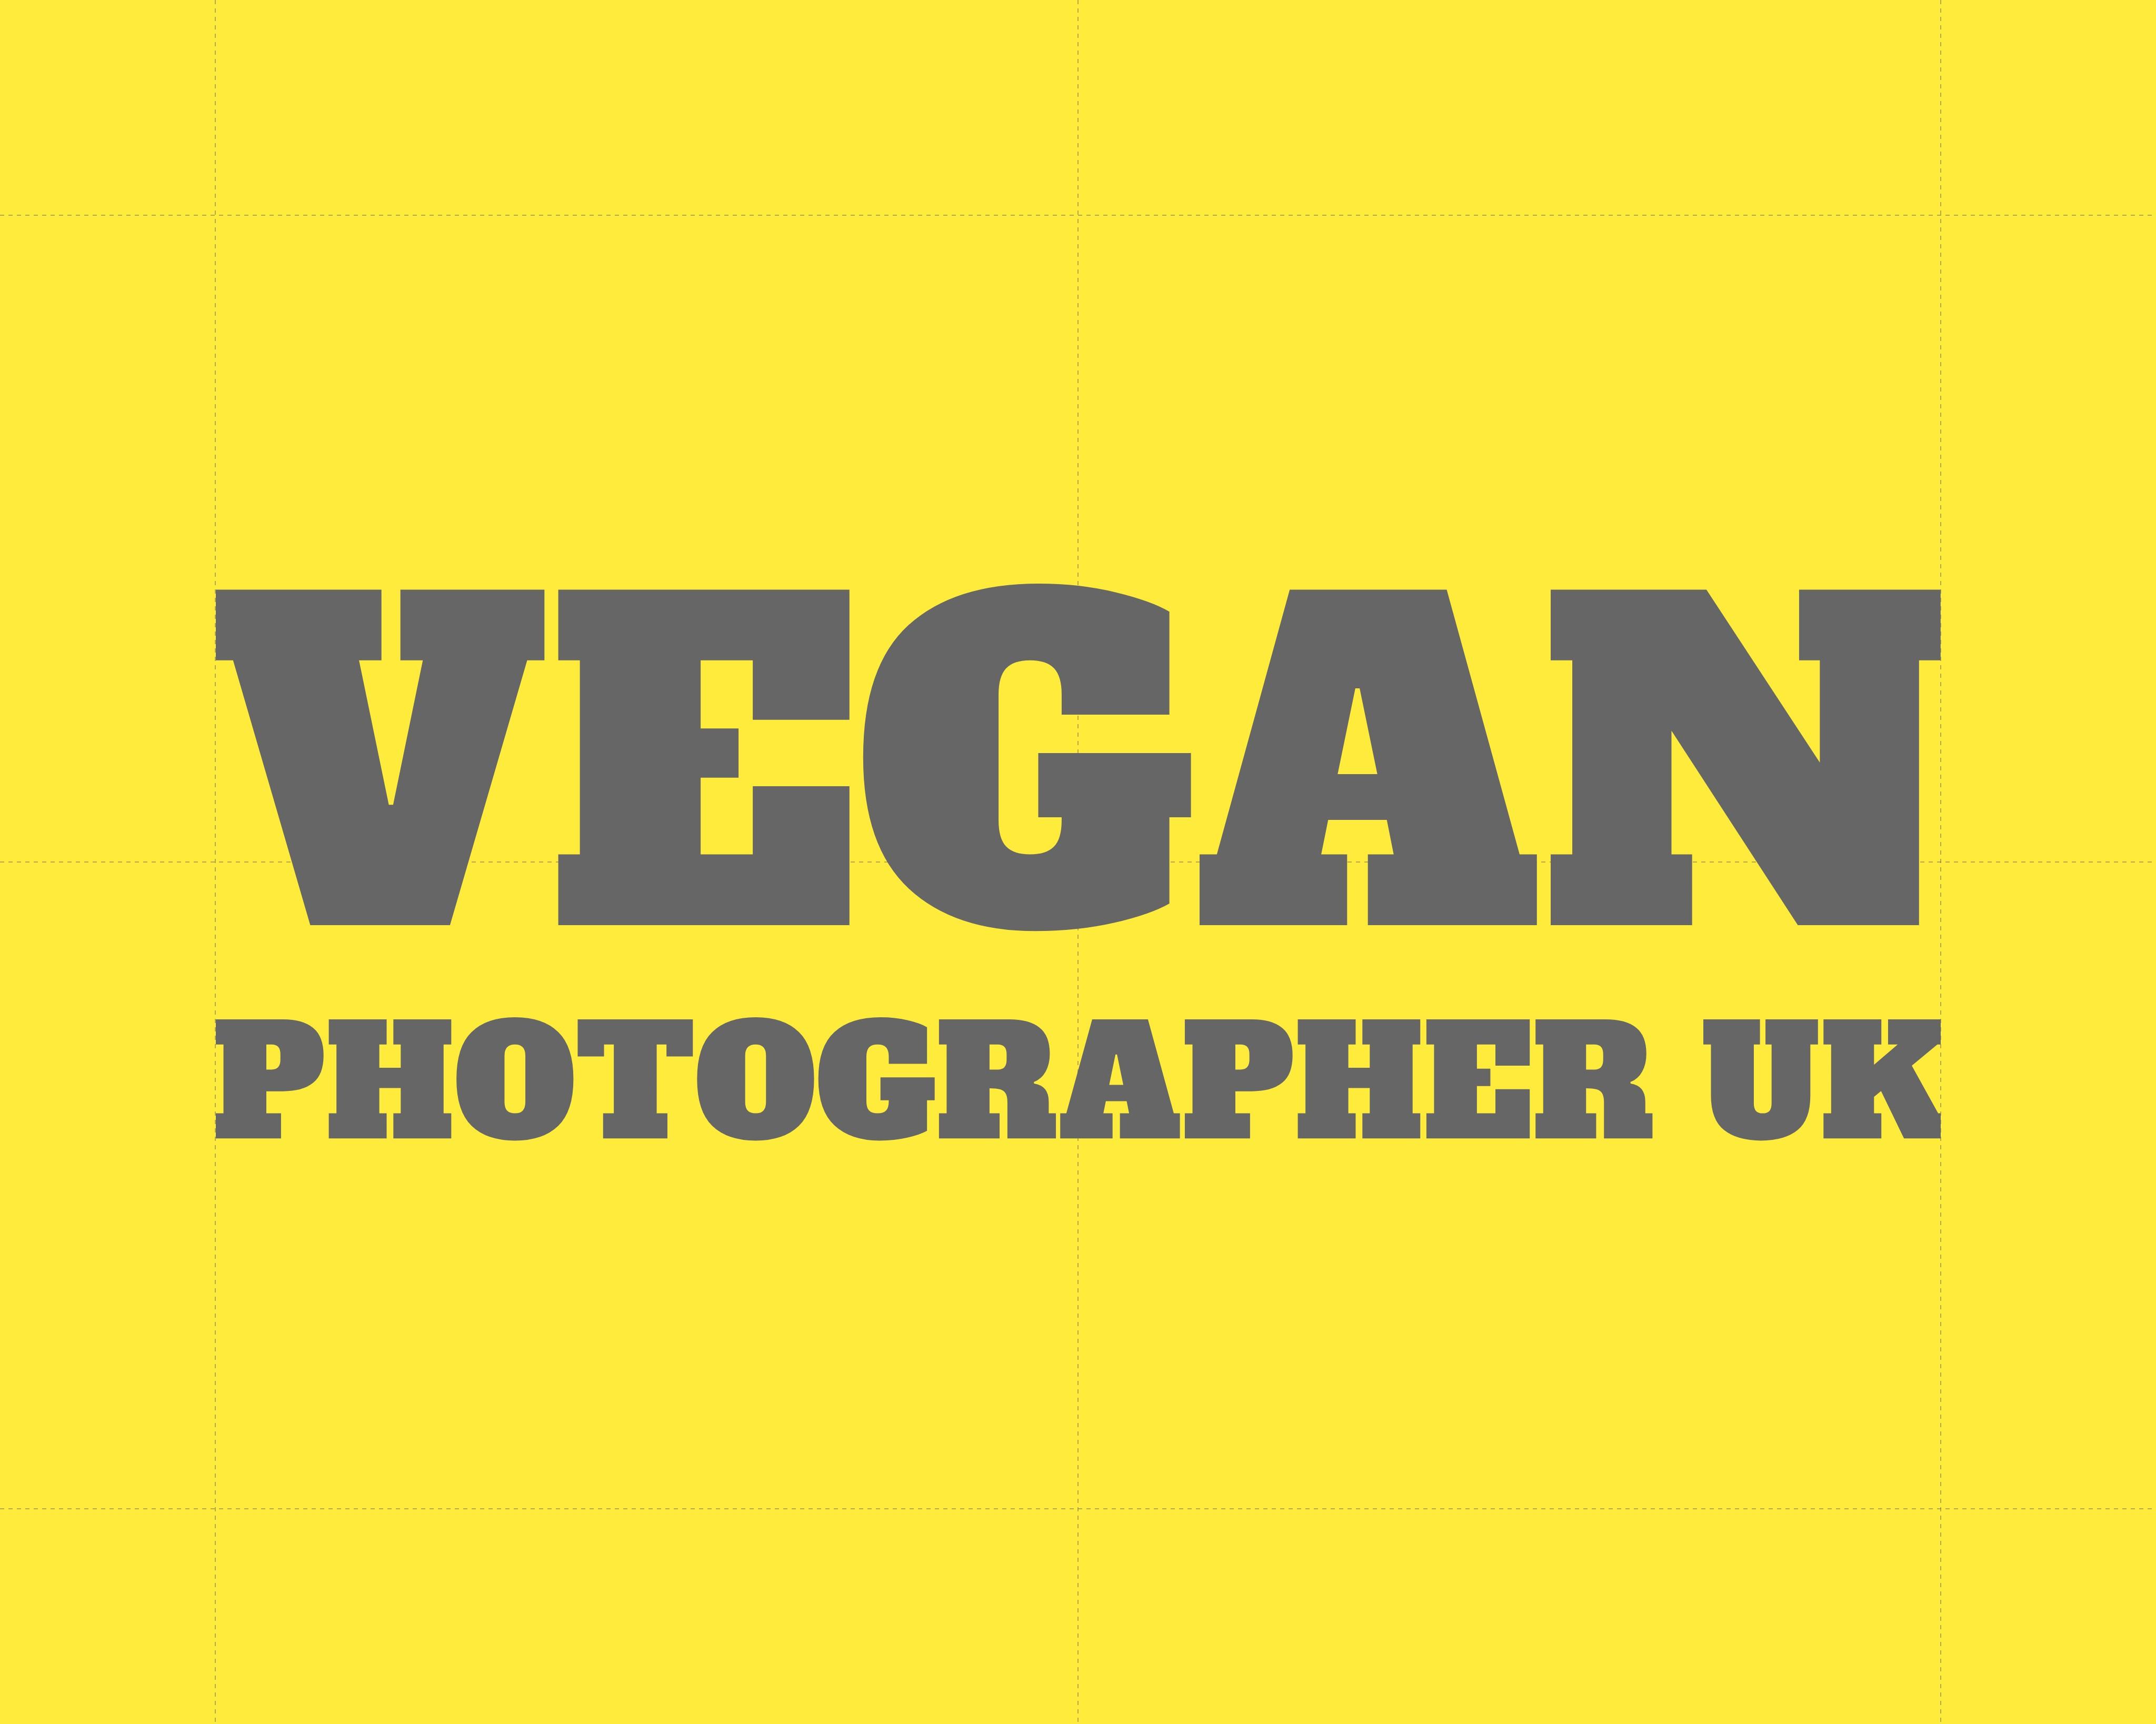 Vegan Photographer UK